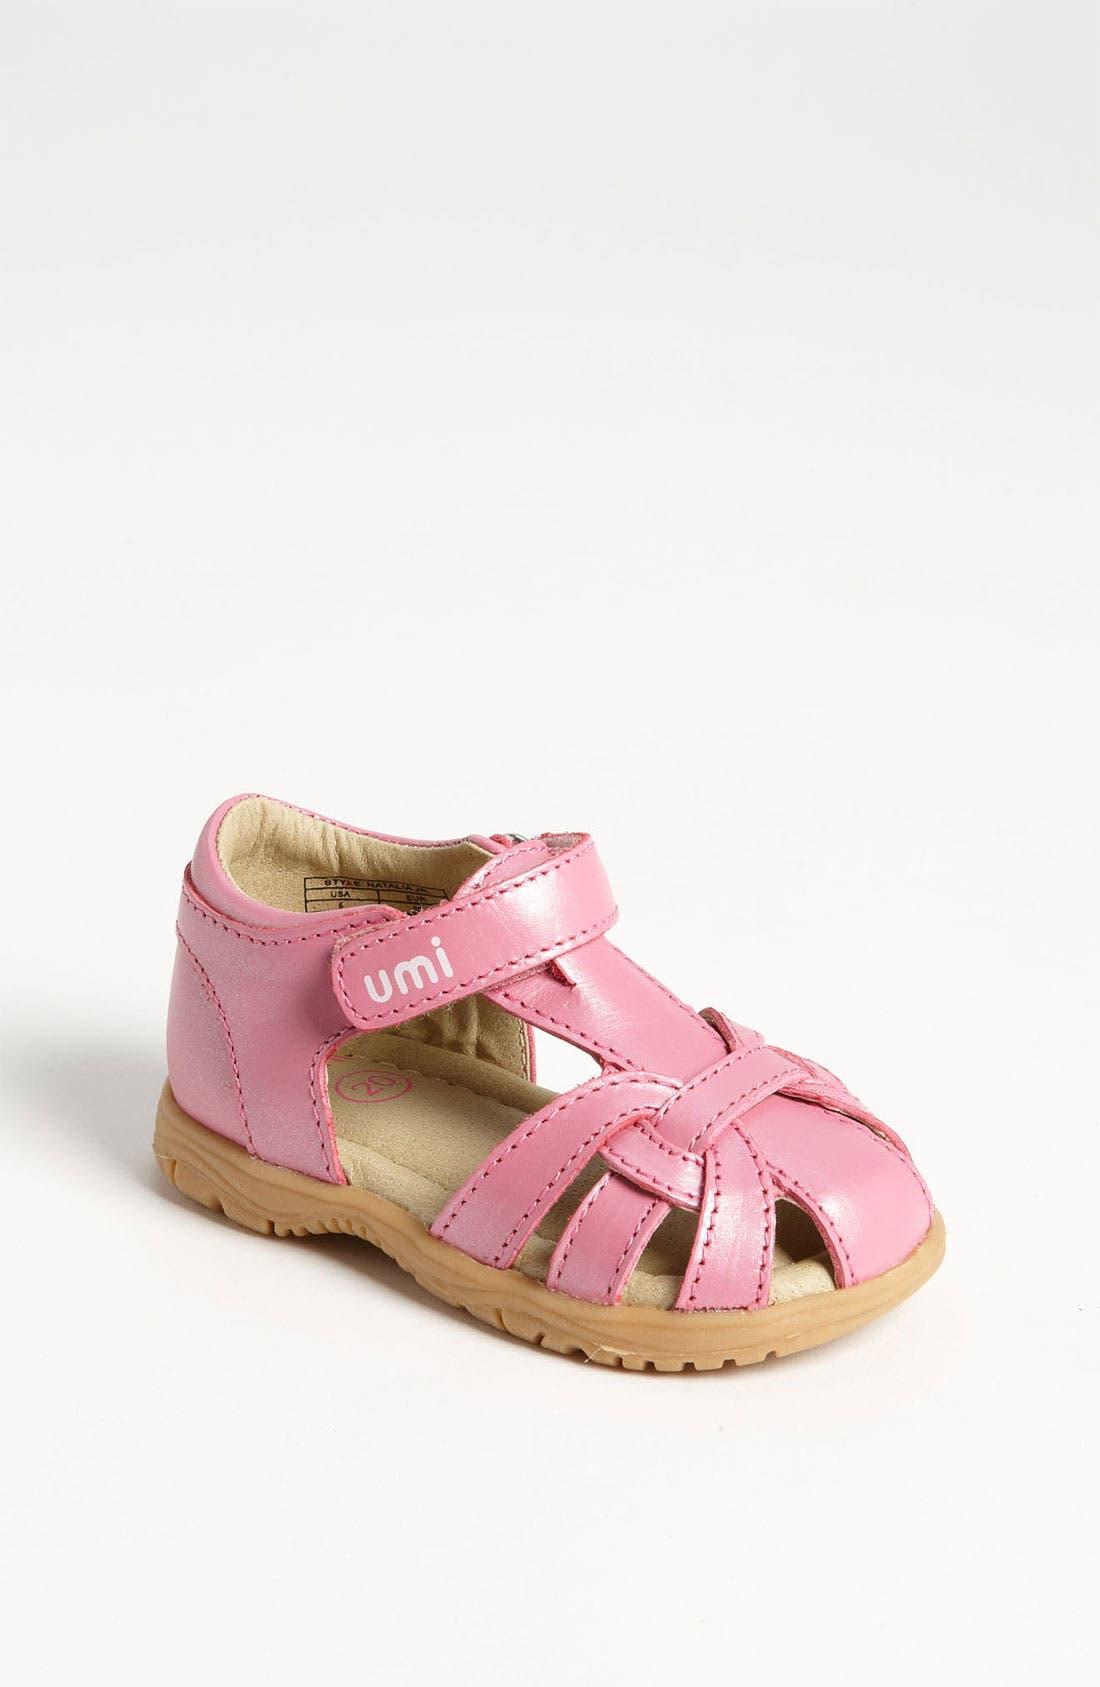 Alternate Image 1 Selected - Umi 'Natalia' Sandal (Baby, Walker & Toddler)